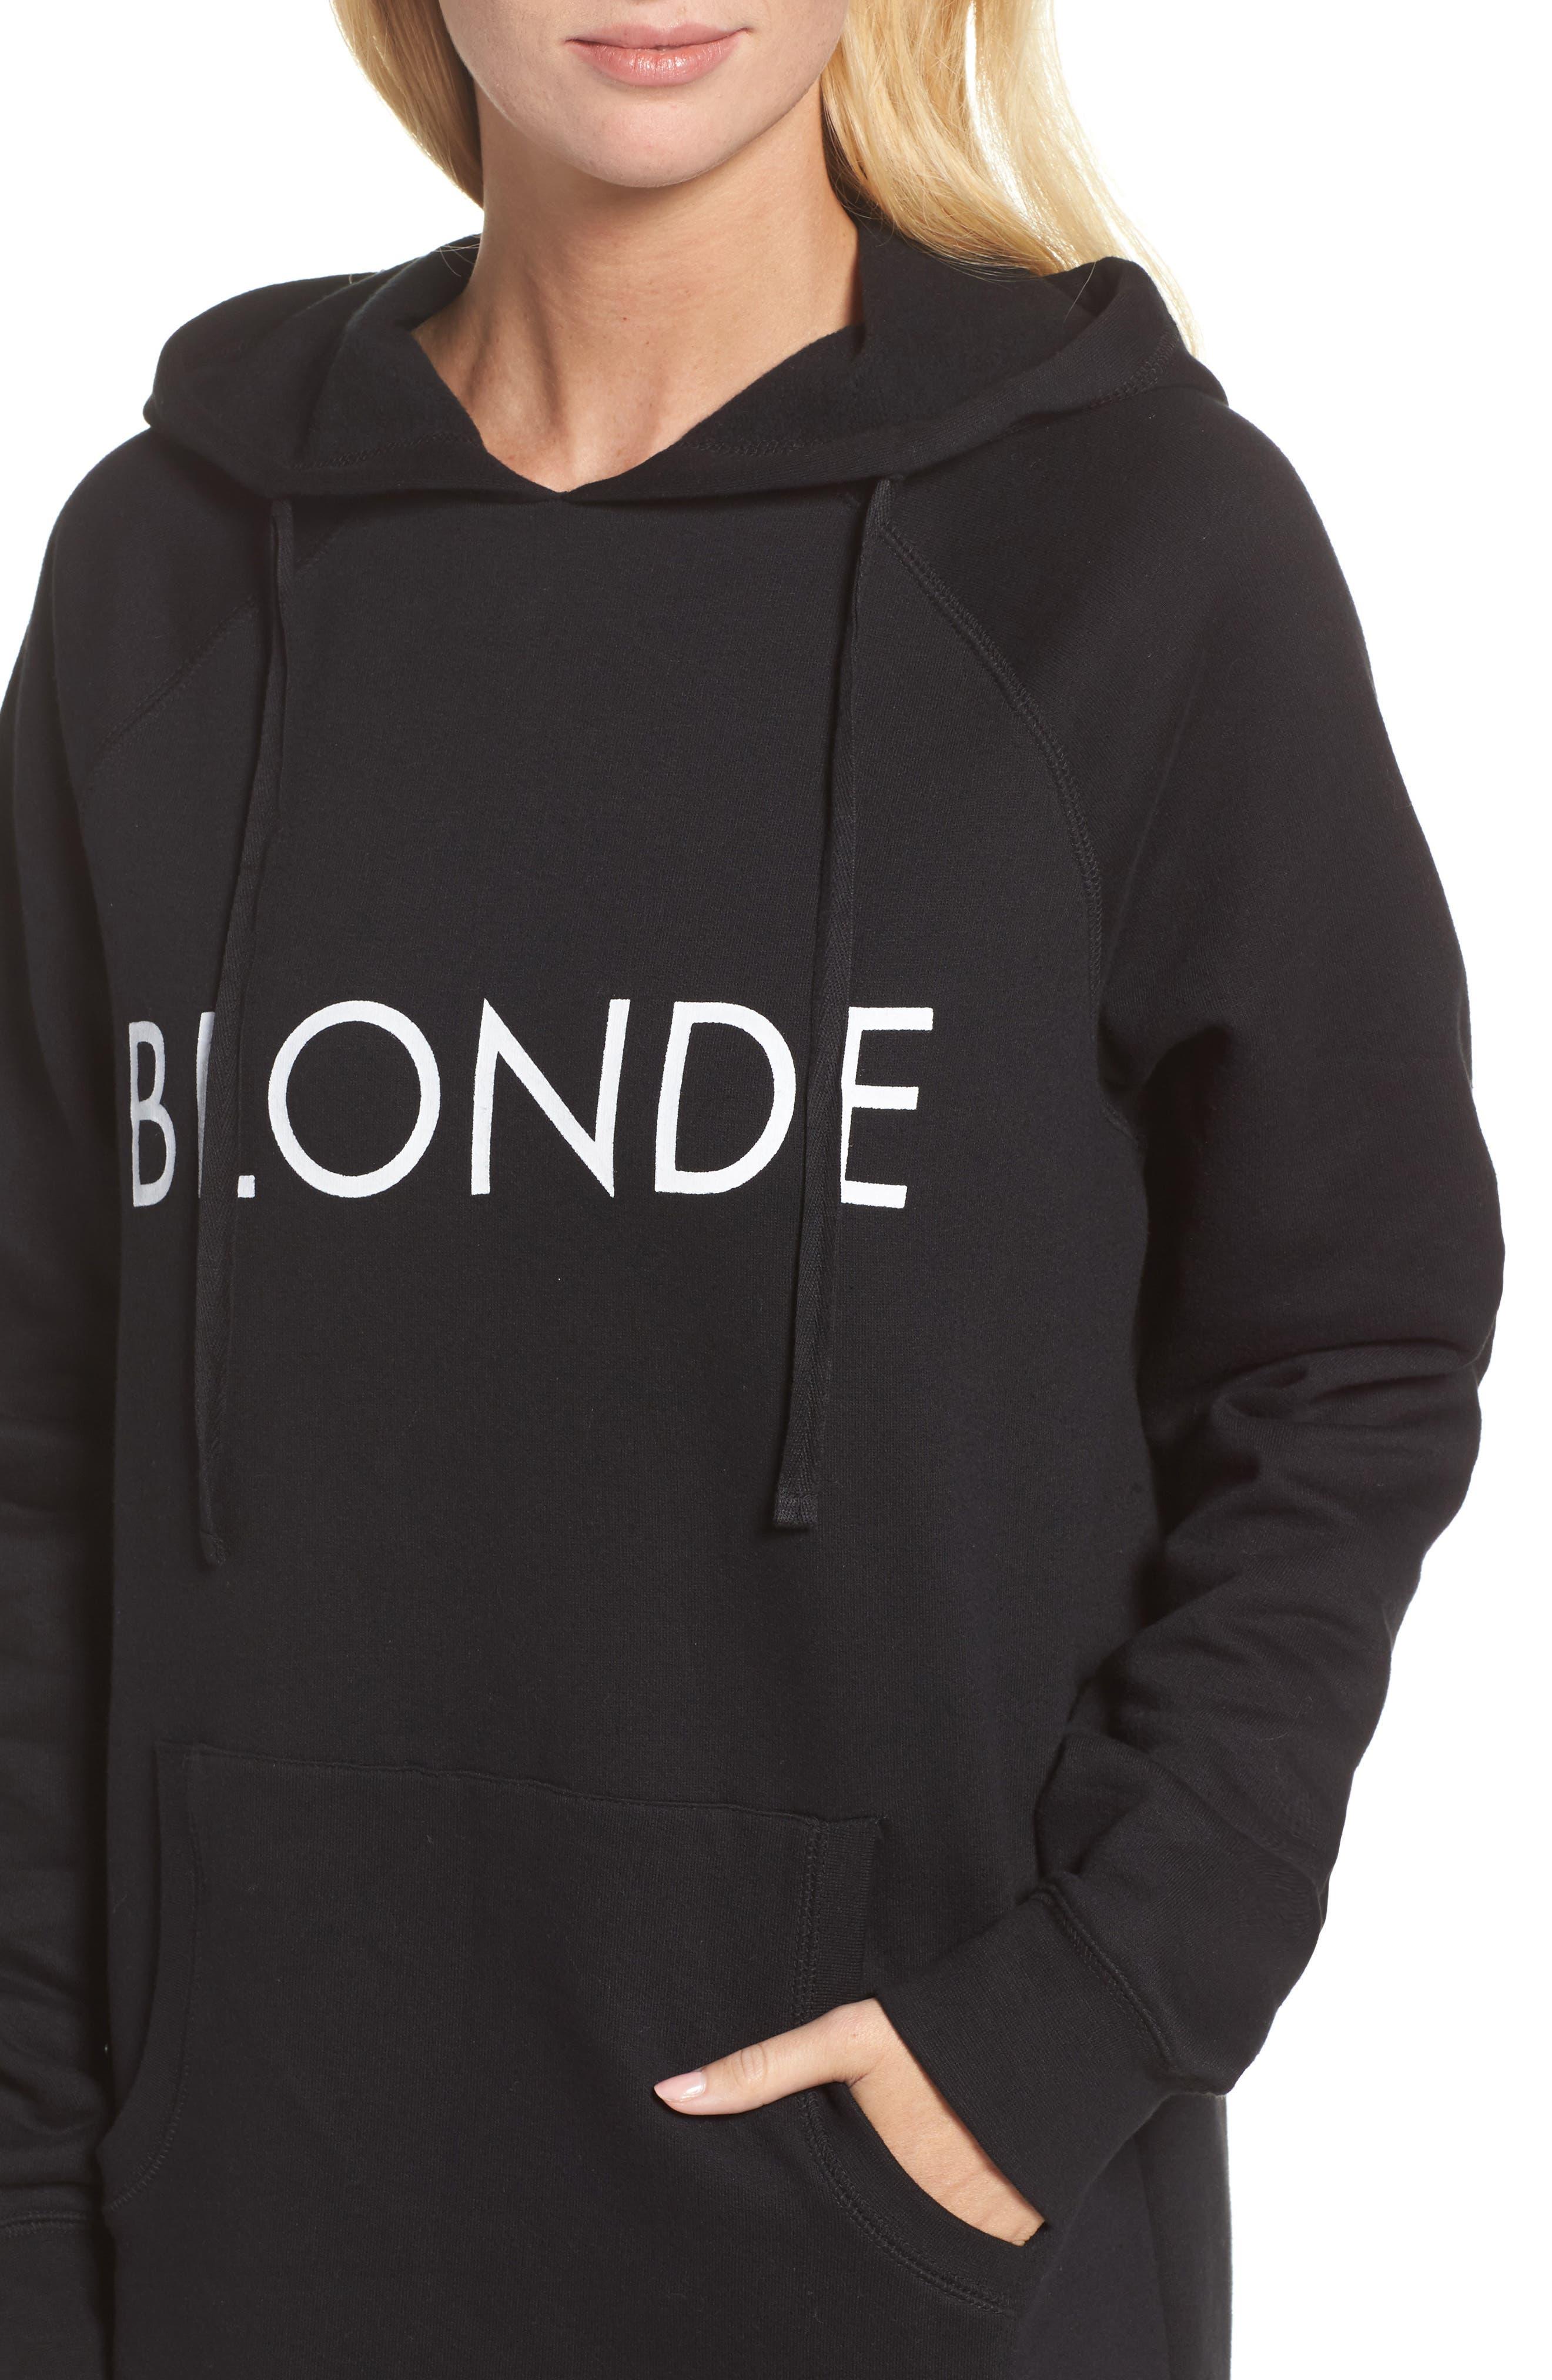 Blonde Tunic Hoodie,                             Alternate thumbnail 4, color,